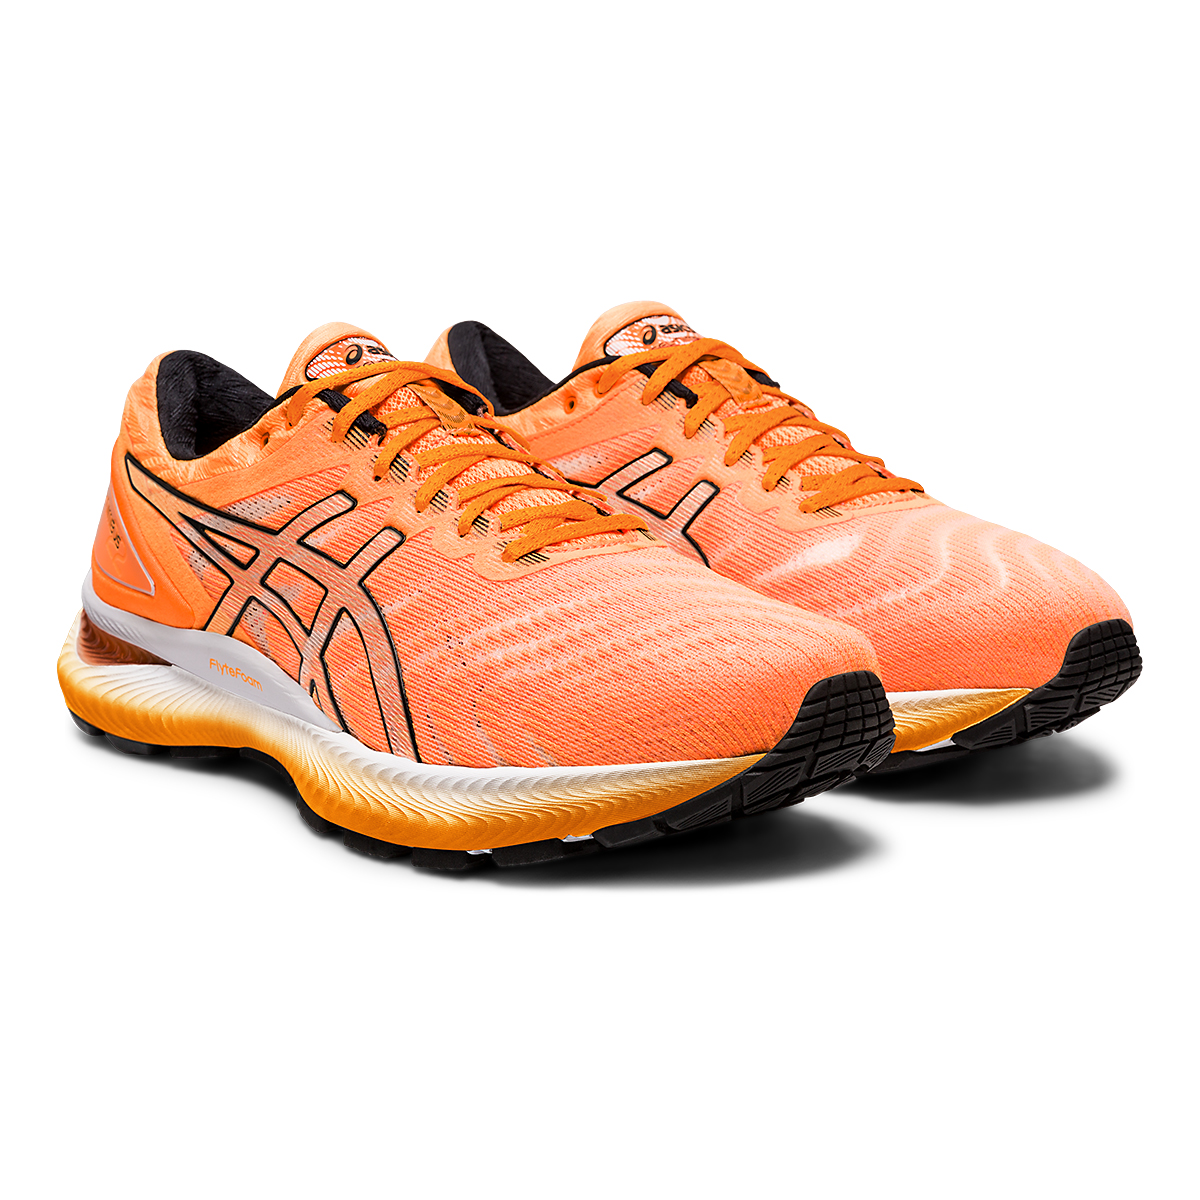 Men's Asics GEL-Nimbus 22 Modern Tokyo Running Shoe - Color: Orange Pop/Black - Size: 6 - Width: Regular, Orange Pop/Black, large, image 2